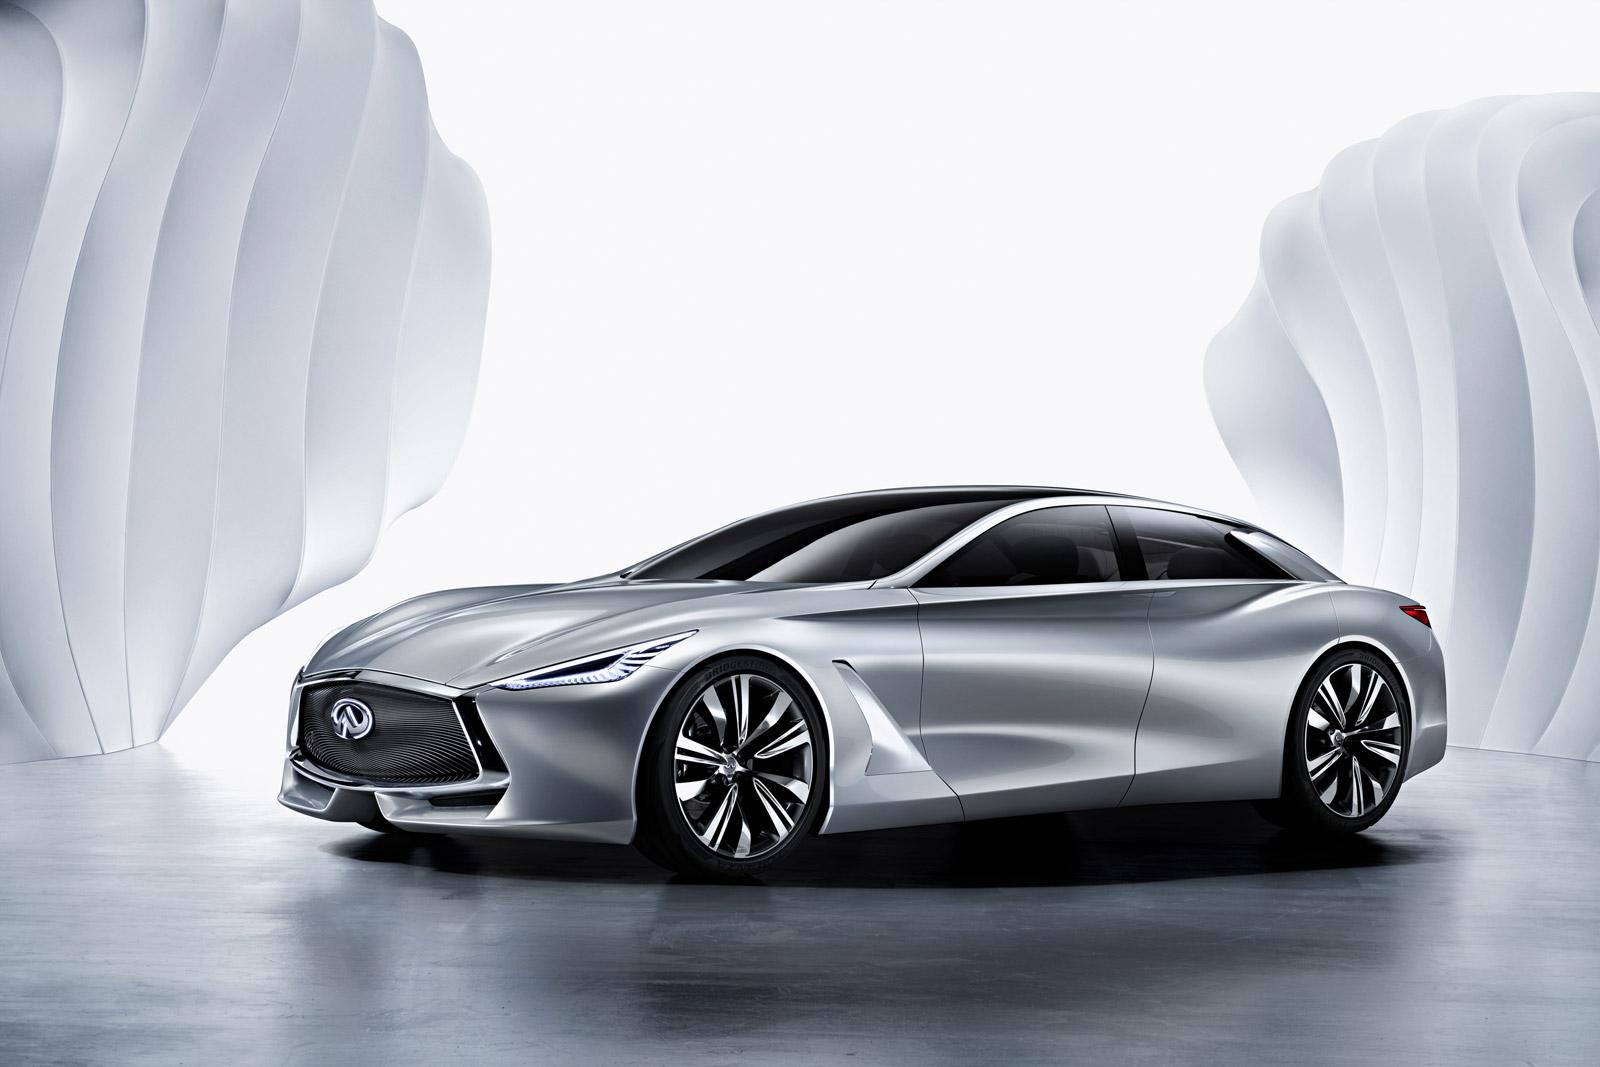 41 New 2020 Infiniti Q80 Sedan Specs and Review by 2020 Infiniti Q80 Sedan